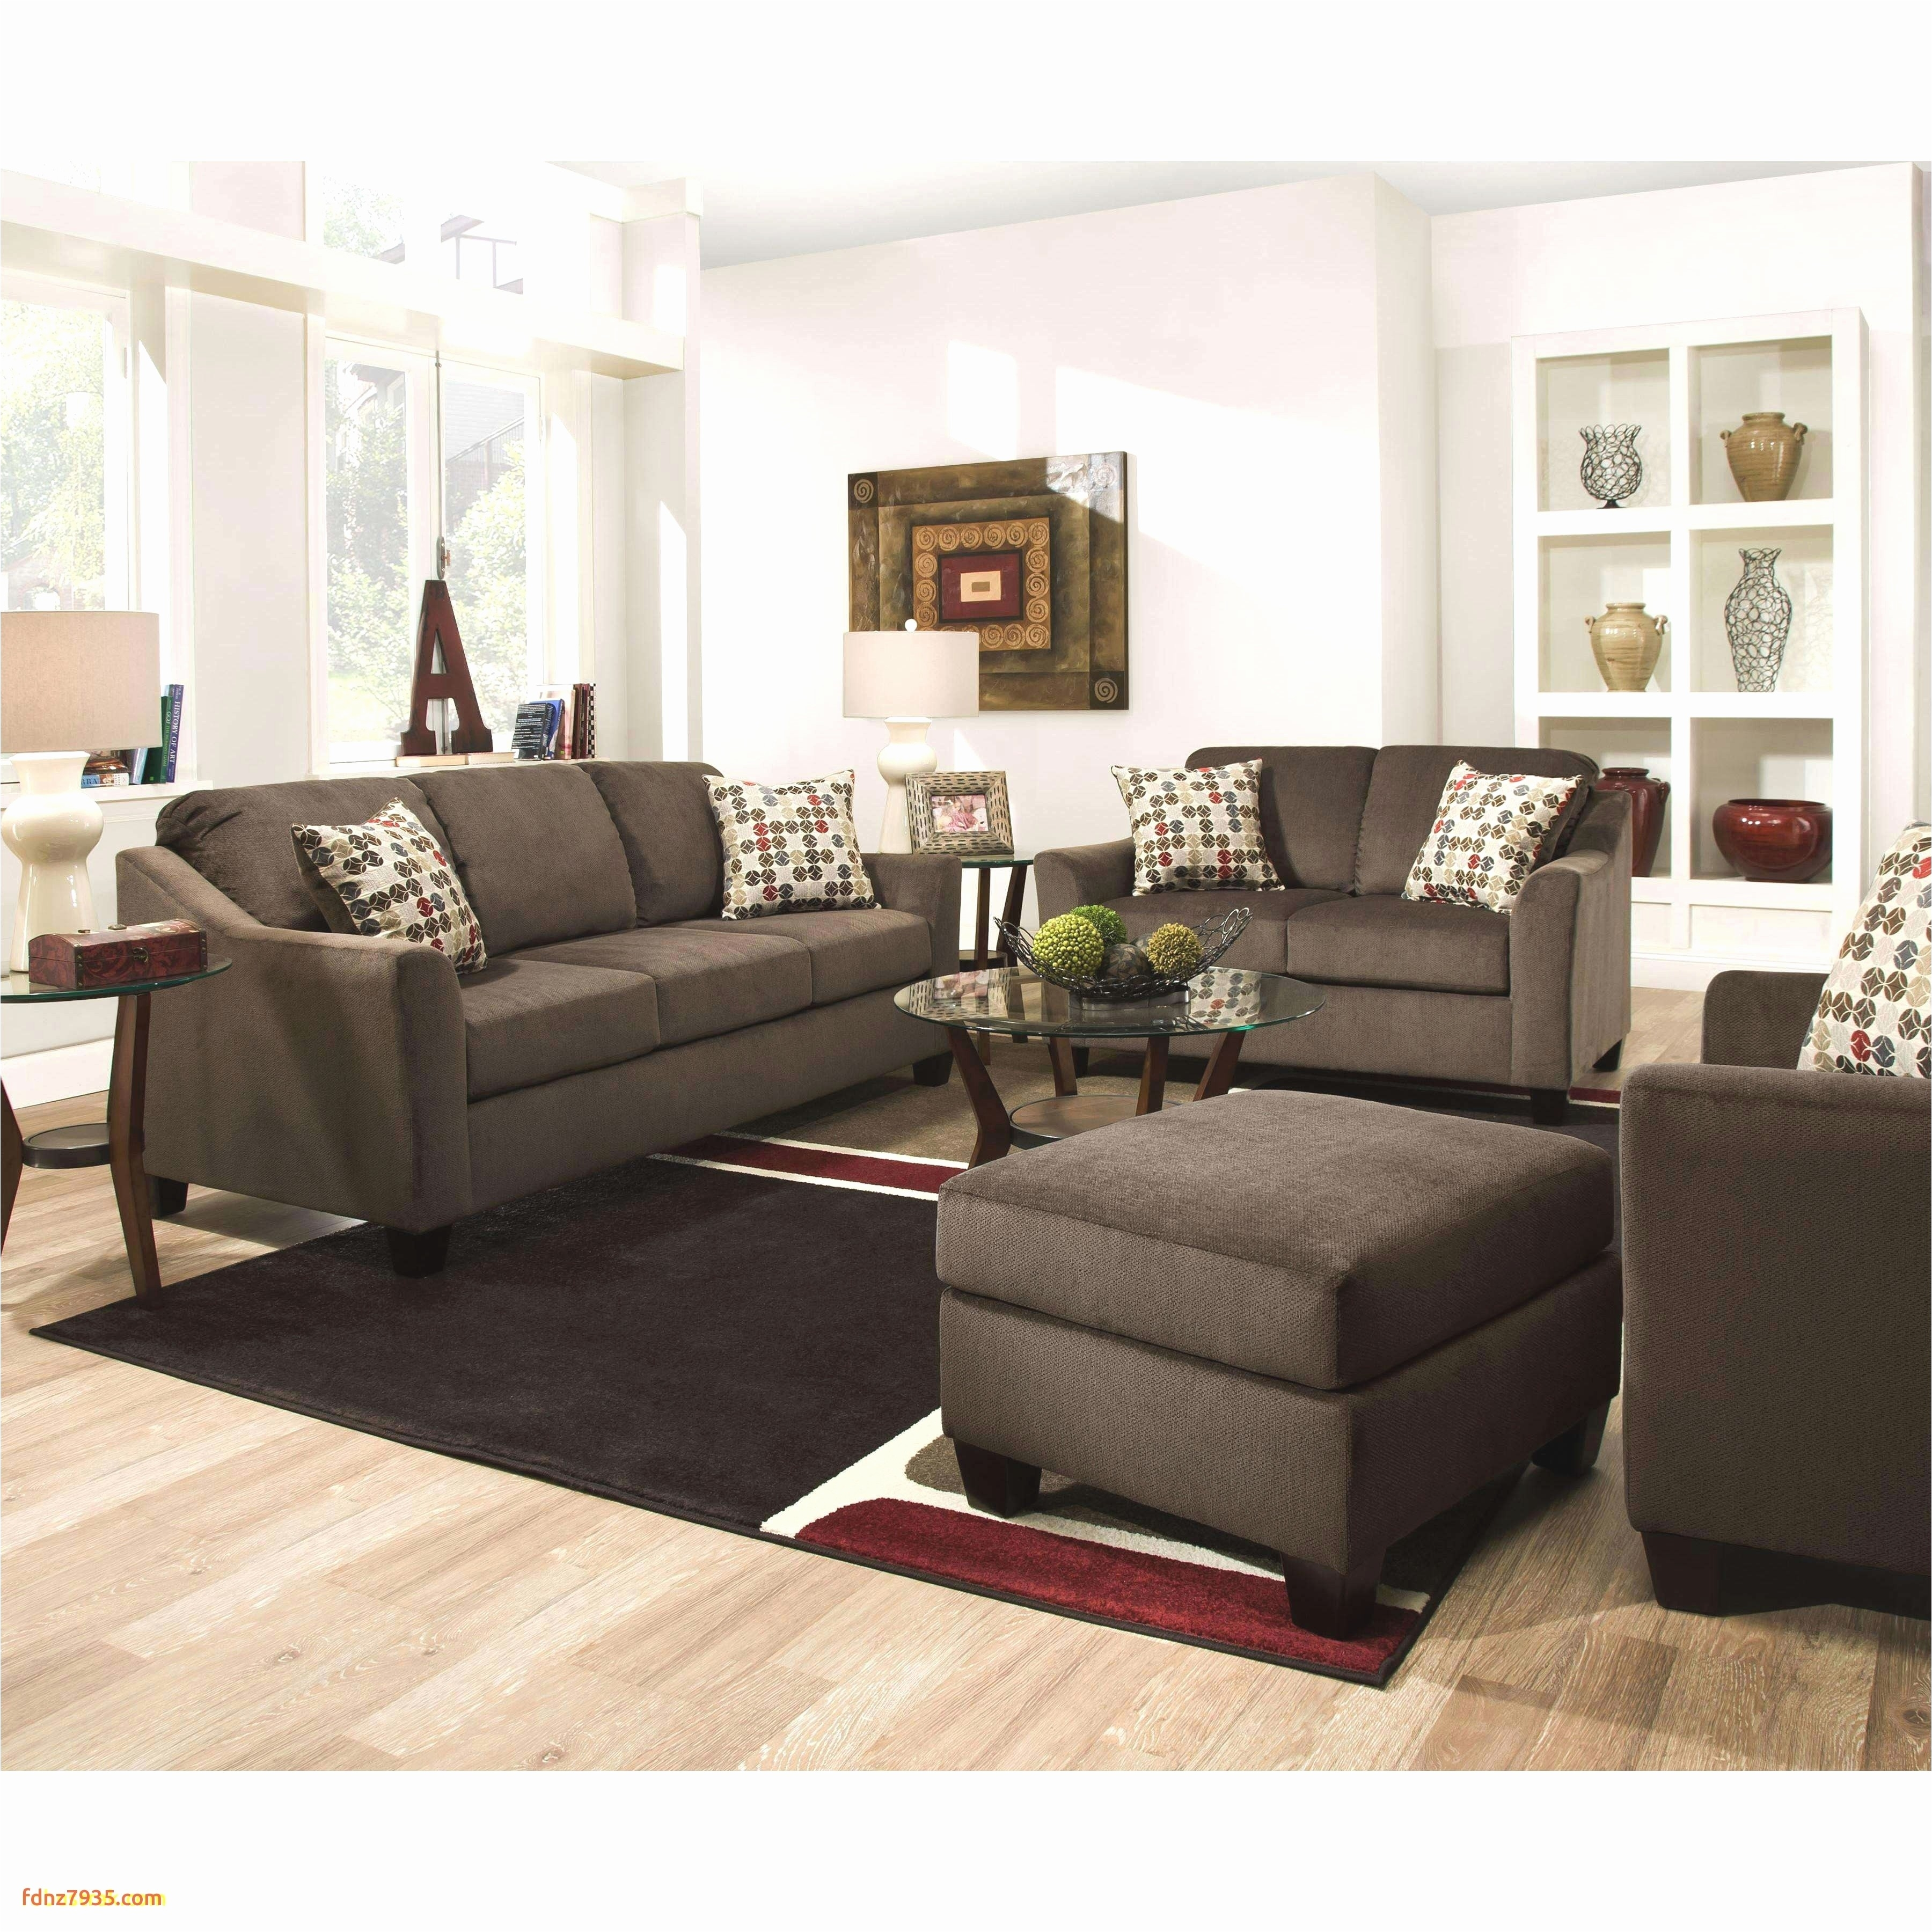 23 inspirational of cheap sofa furniture photos home furniture ideas